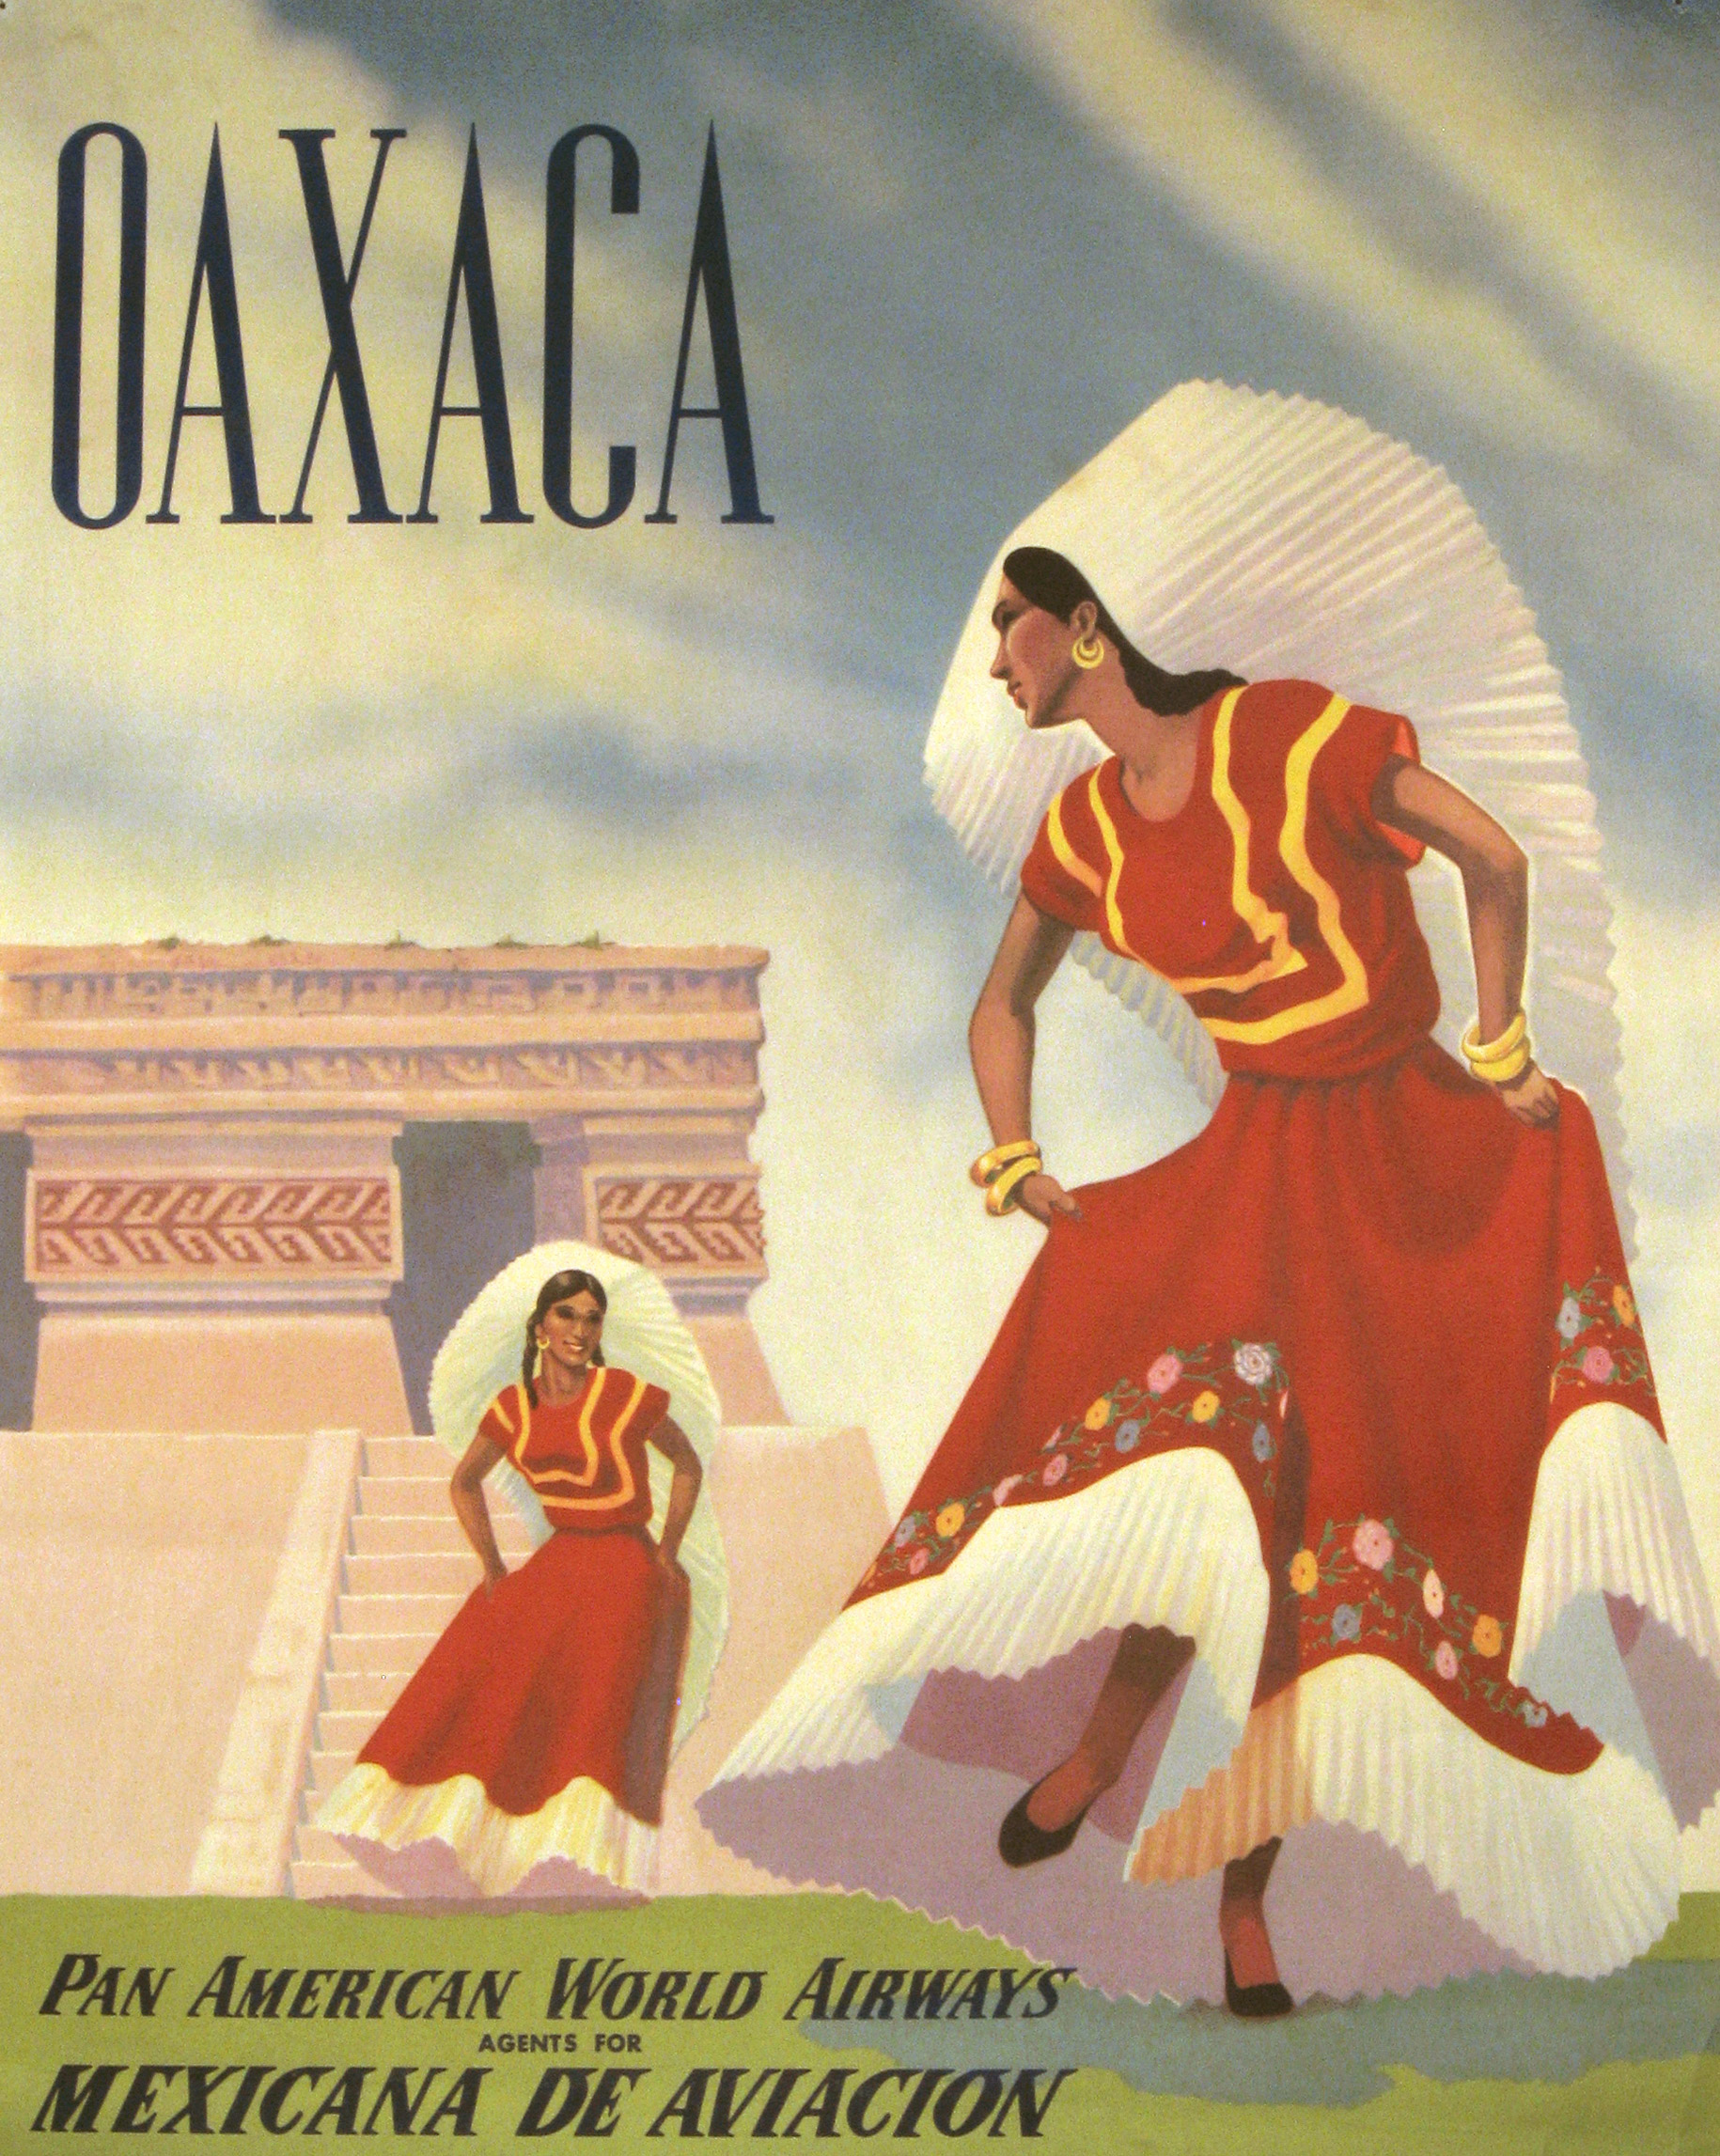 Pan Am Oaxaca circa 1950.